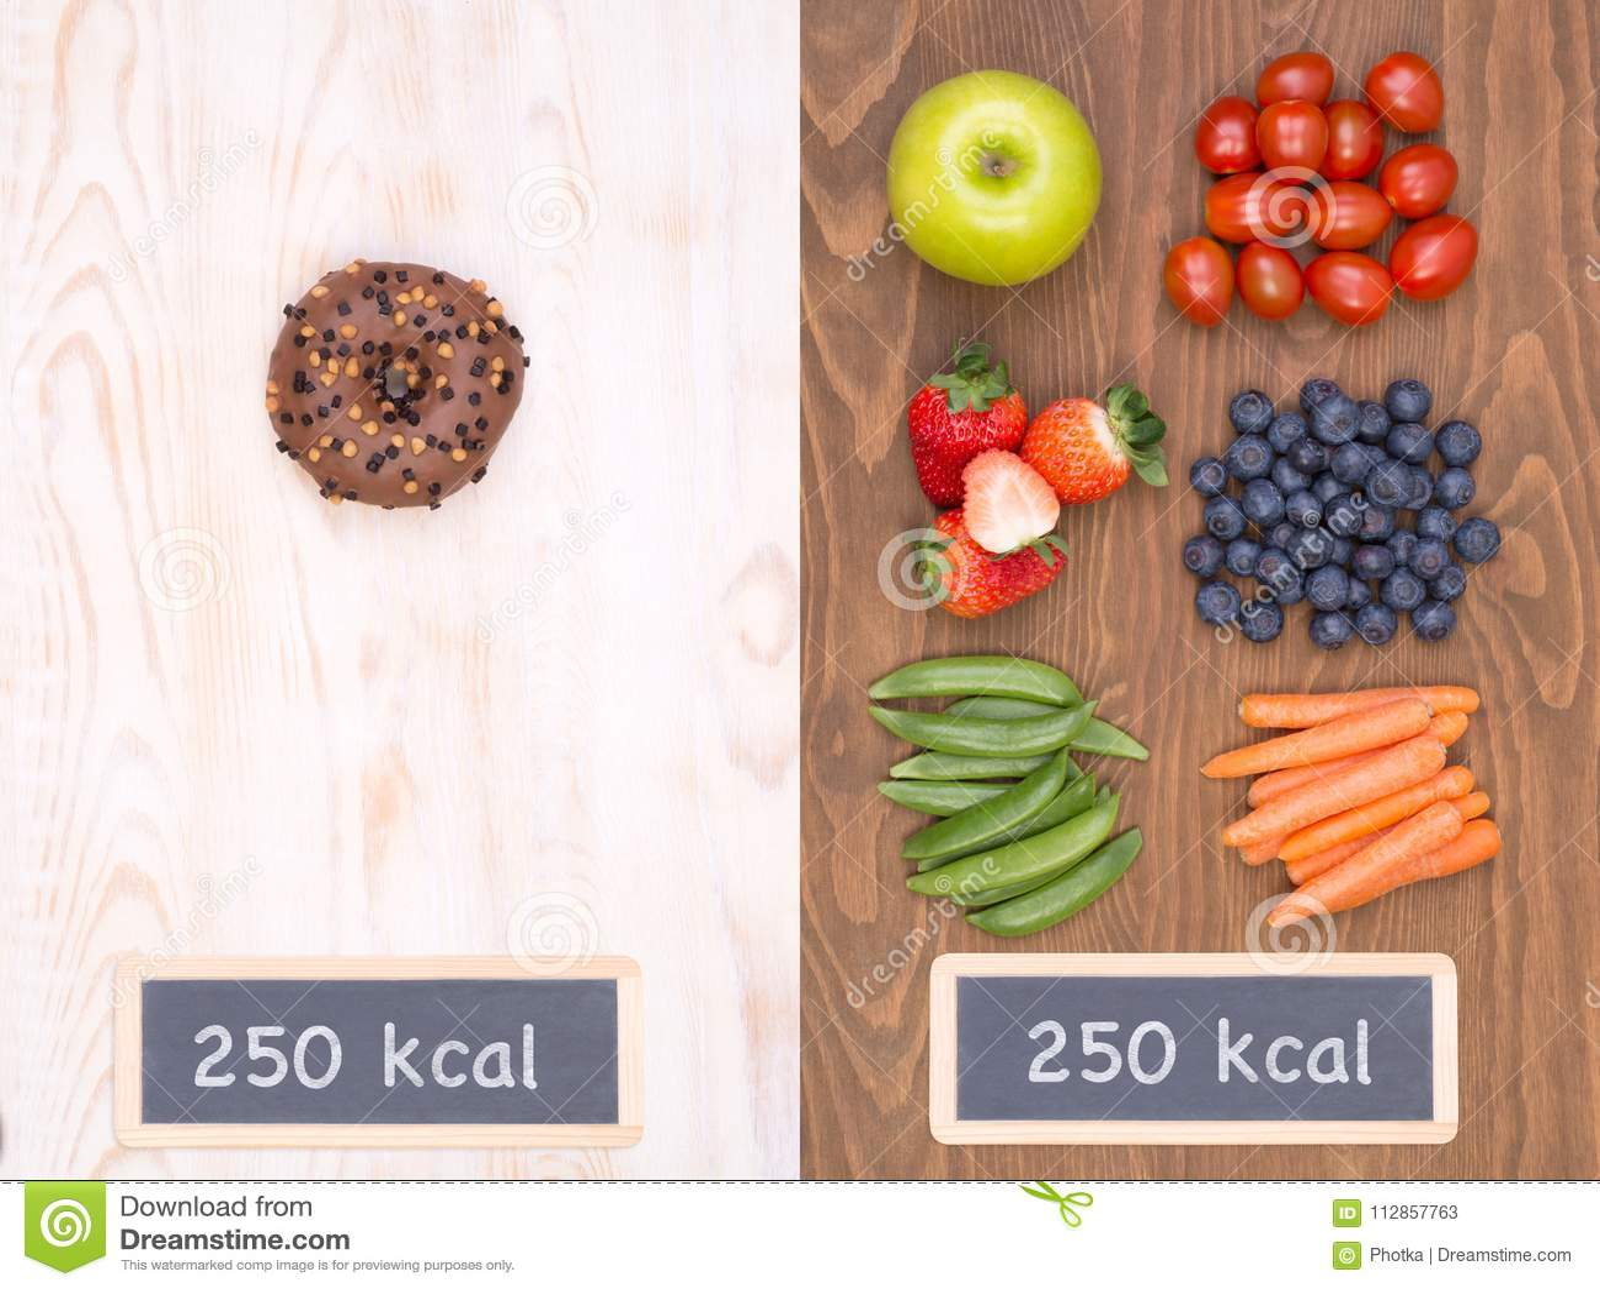 Healthy Vs Unhealthy Food Concept Stock Image Image Of